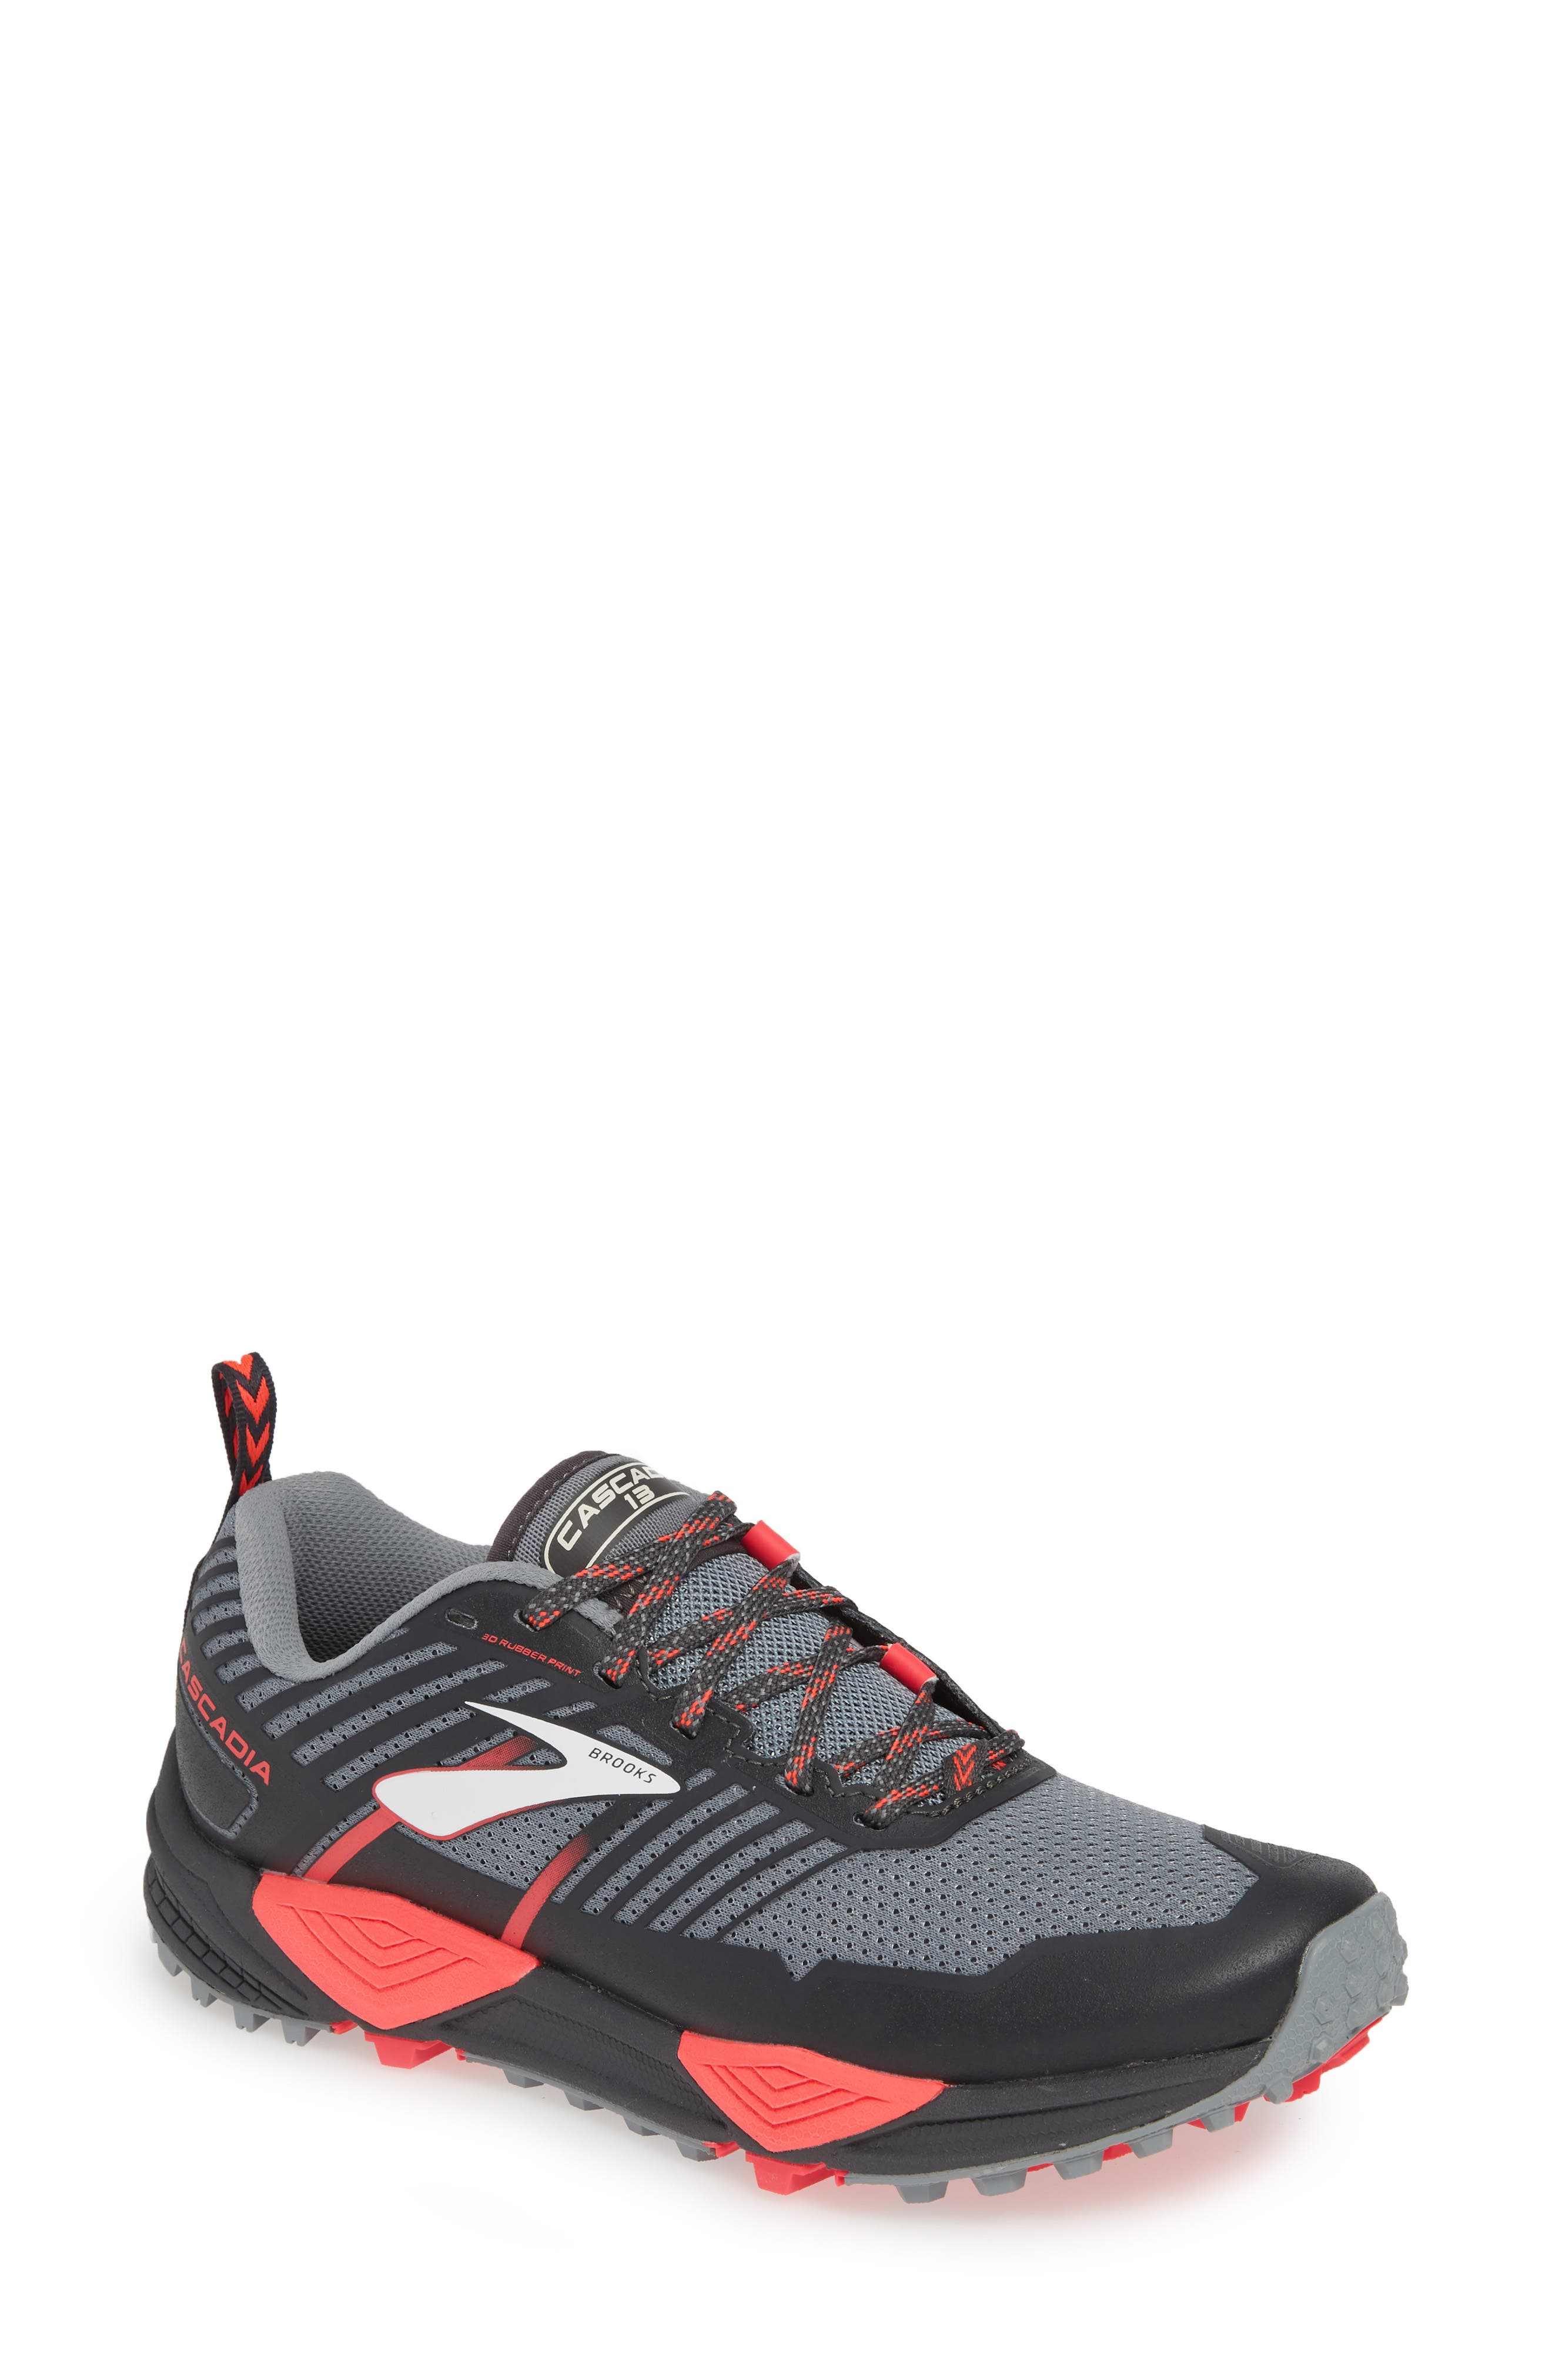 Brooks Cascadia 13 Trail Running Shoe, Grey